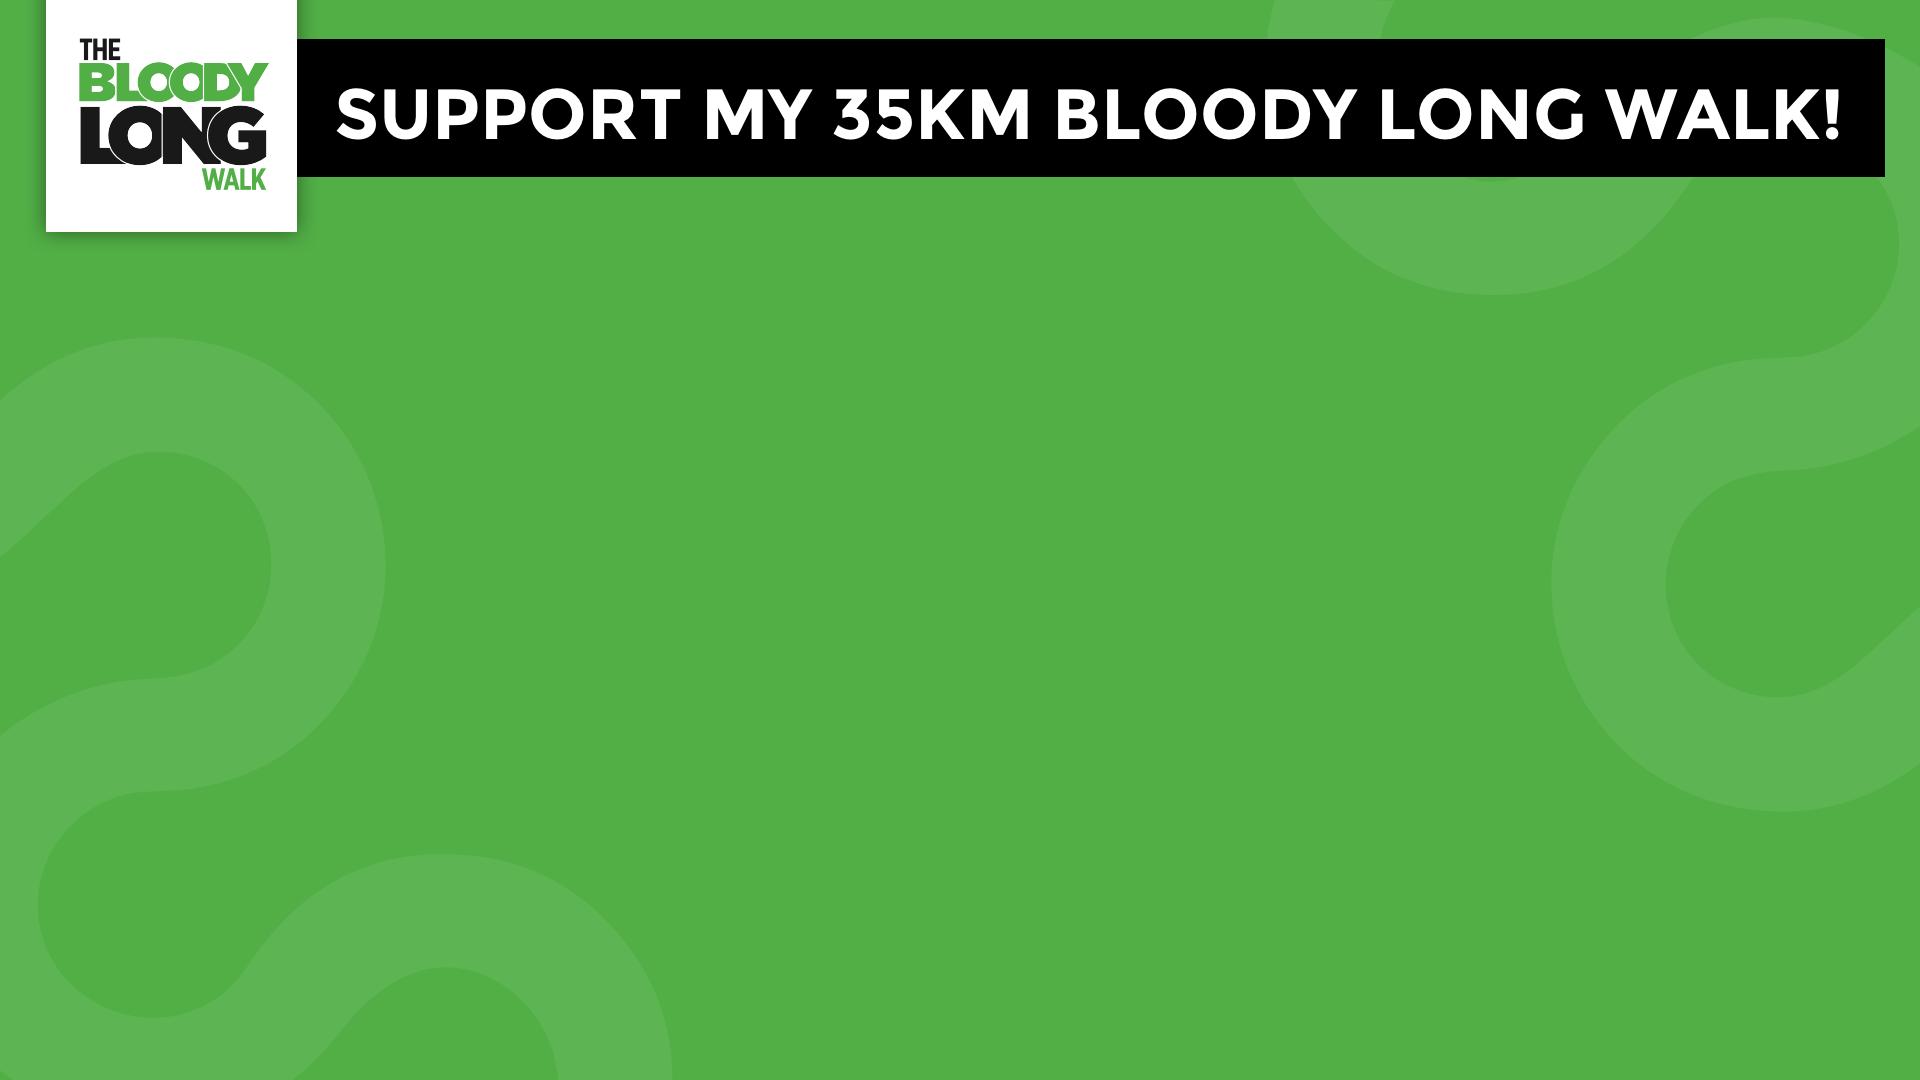 BLW-zoomBG-green-1 (1)